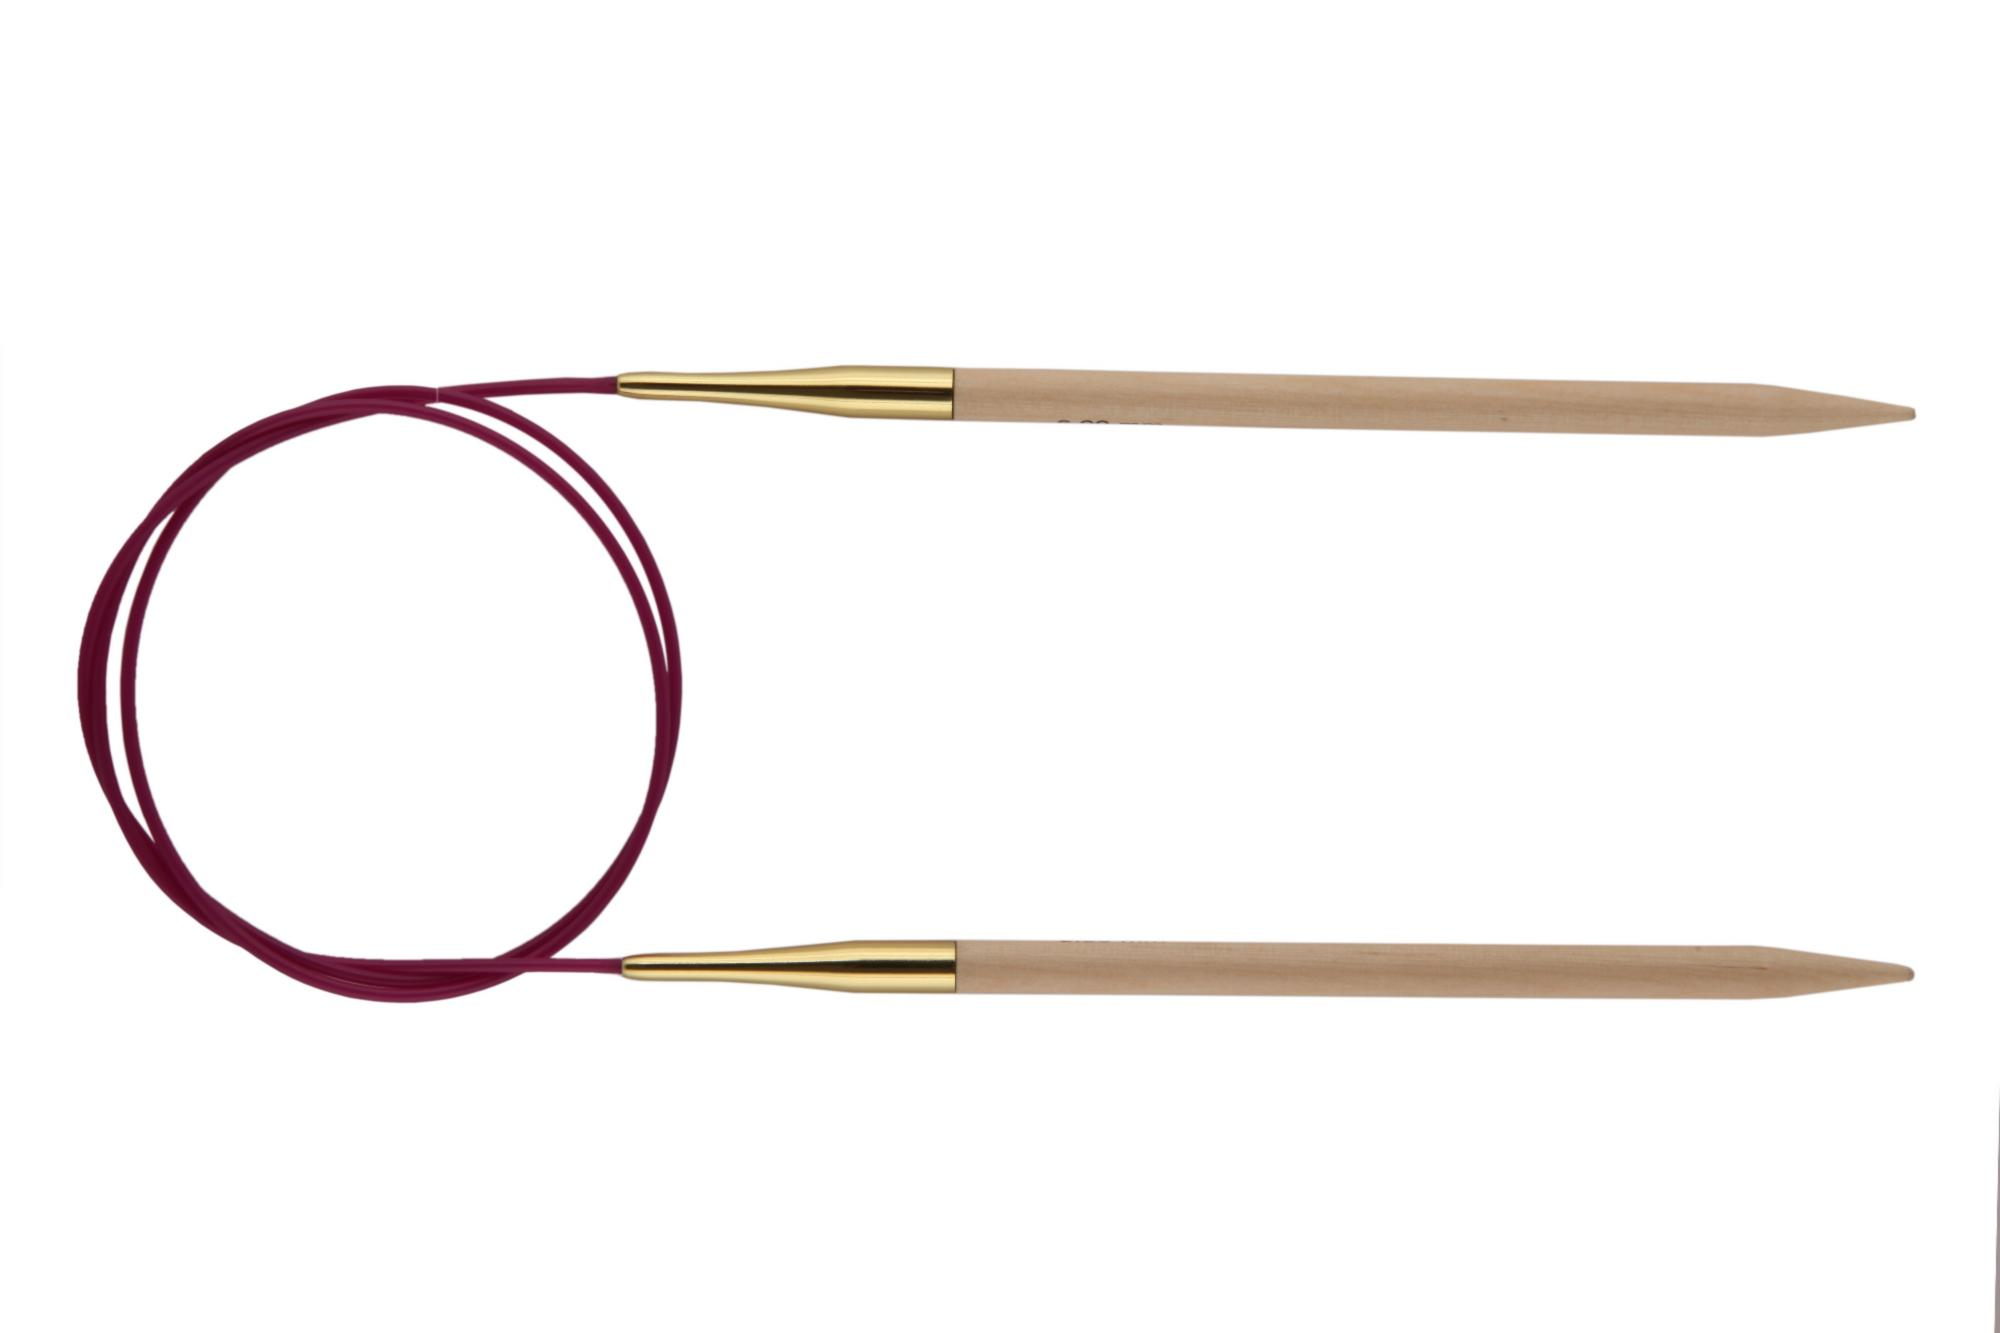 Спицы круговые 120 см Basix Birch Wood KnitPro, 35400, 3.00 мм